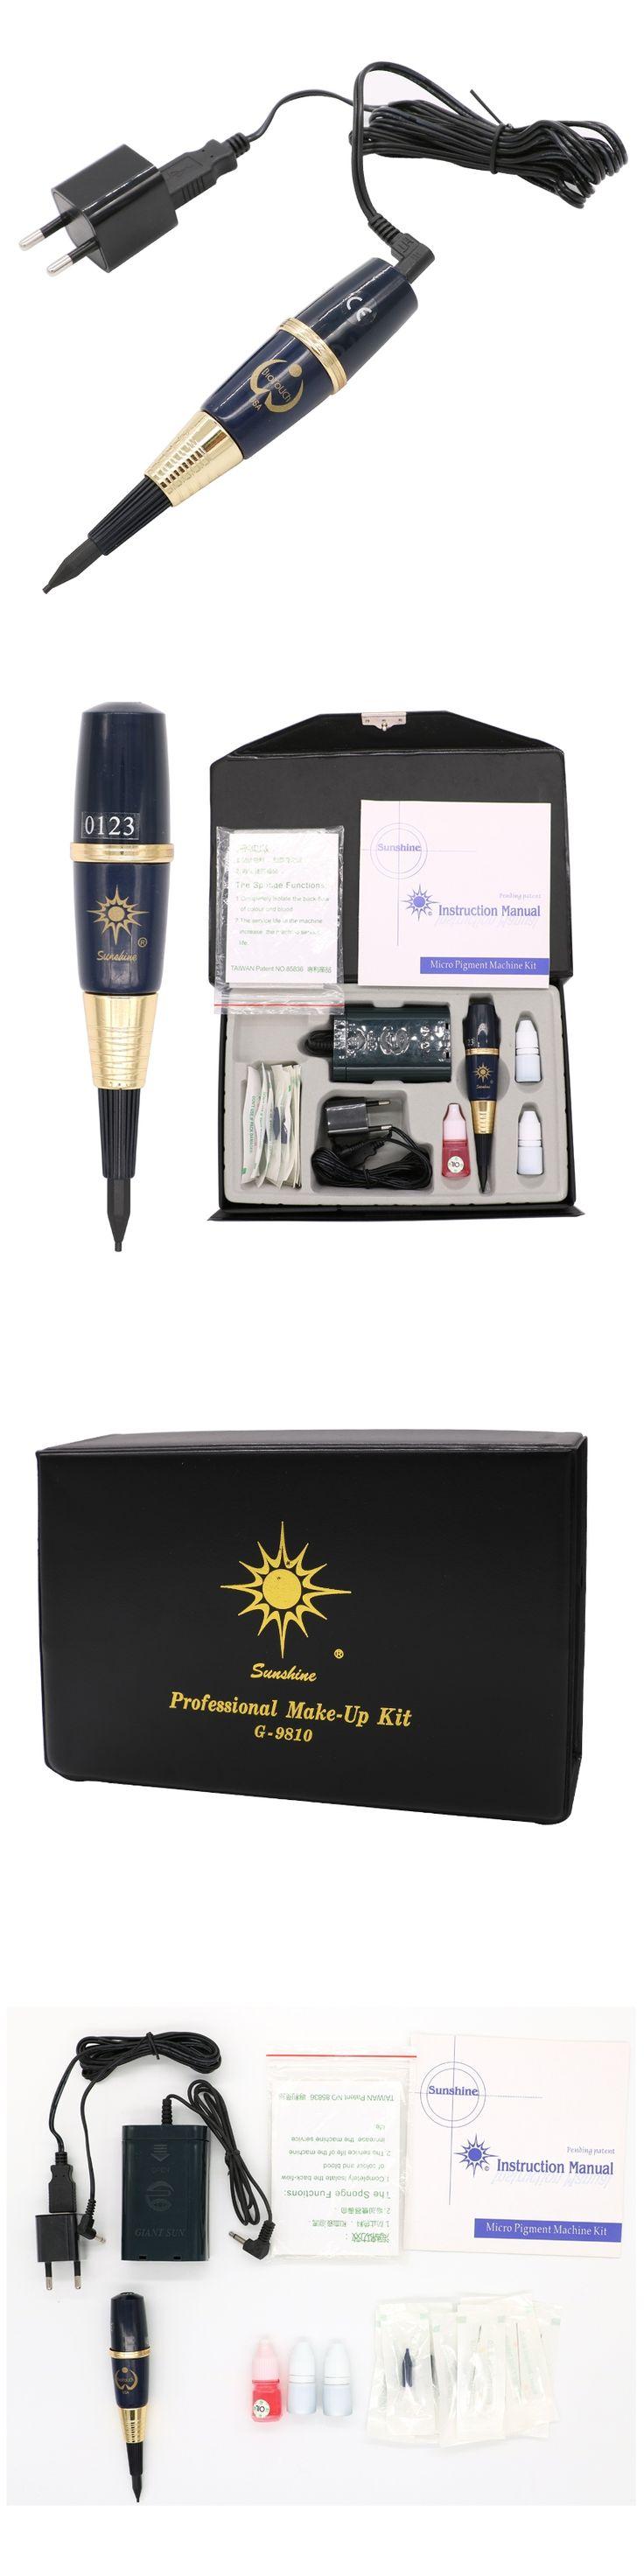 Free shipping 1 set USA biotouch Sunshine tattoo machine kit  permanent makeup machine kit For Eyebrow and Lip With Tattoo Gun